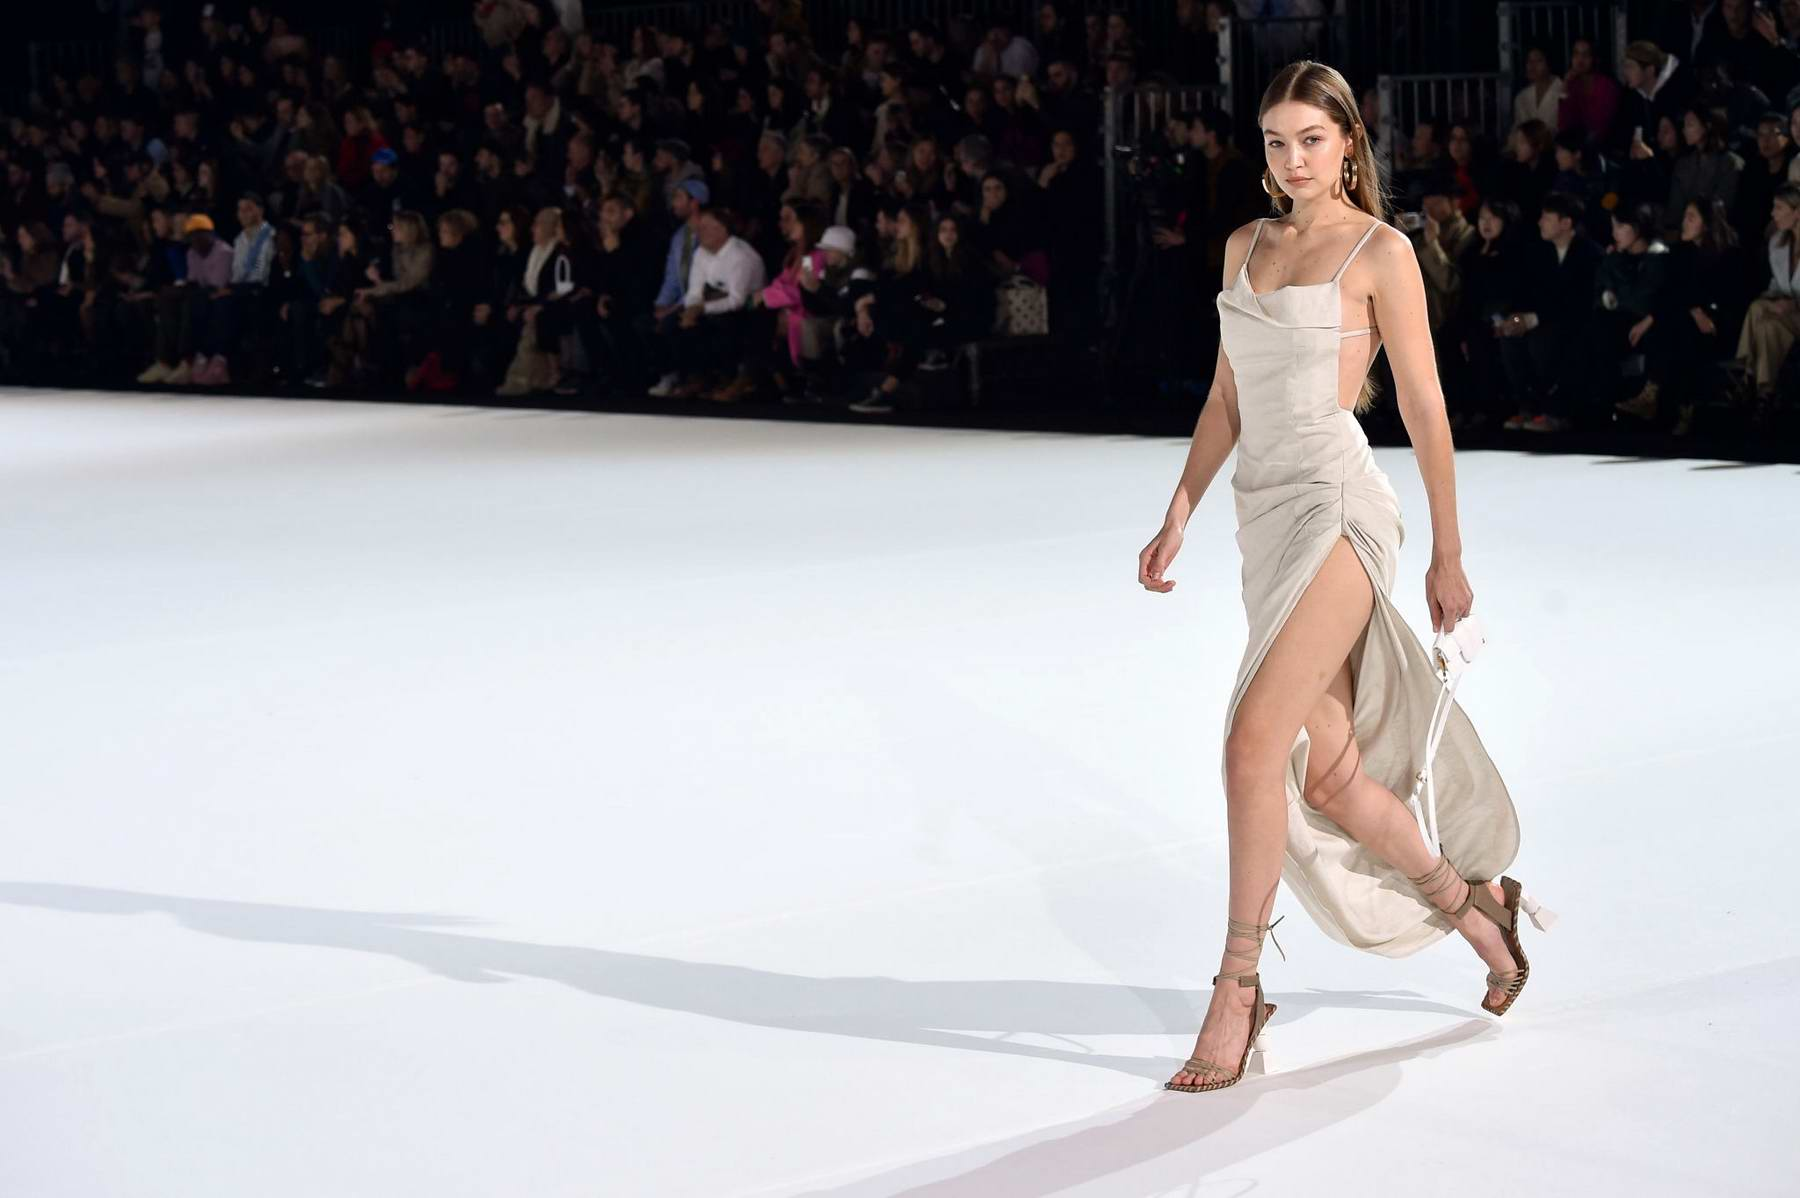 gigi-hadid-walks-the-runway-during-the-jacquemus-menswear-fall-winter-2020-2021-show-in-paris-france-180120_5